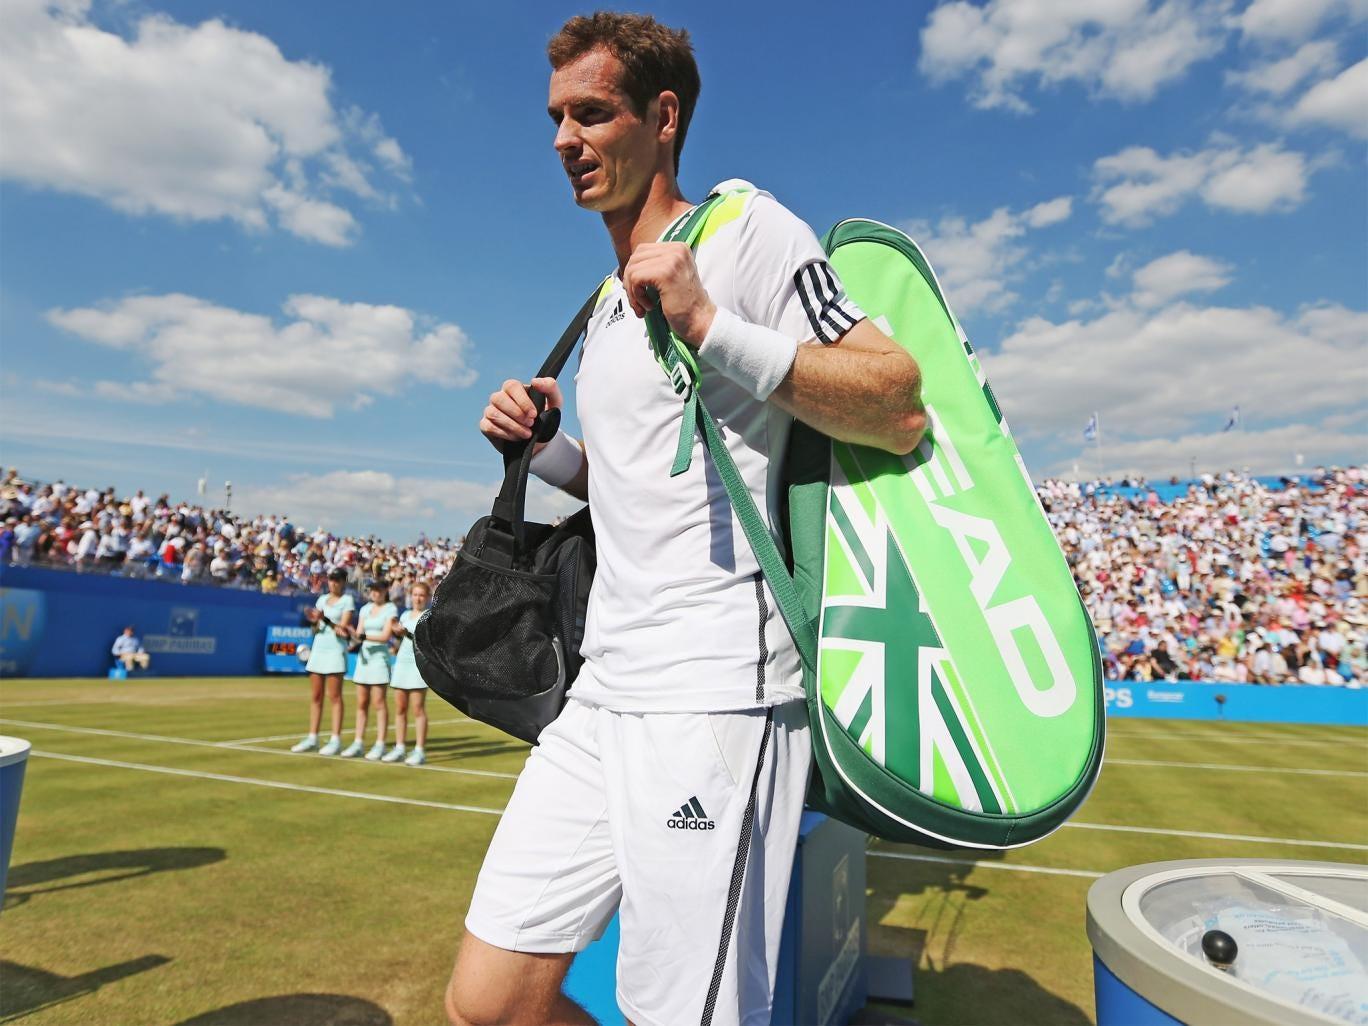 Andy Murray leaves the court following his defeat against Radek Stepanek at Queens last week